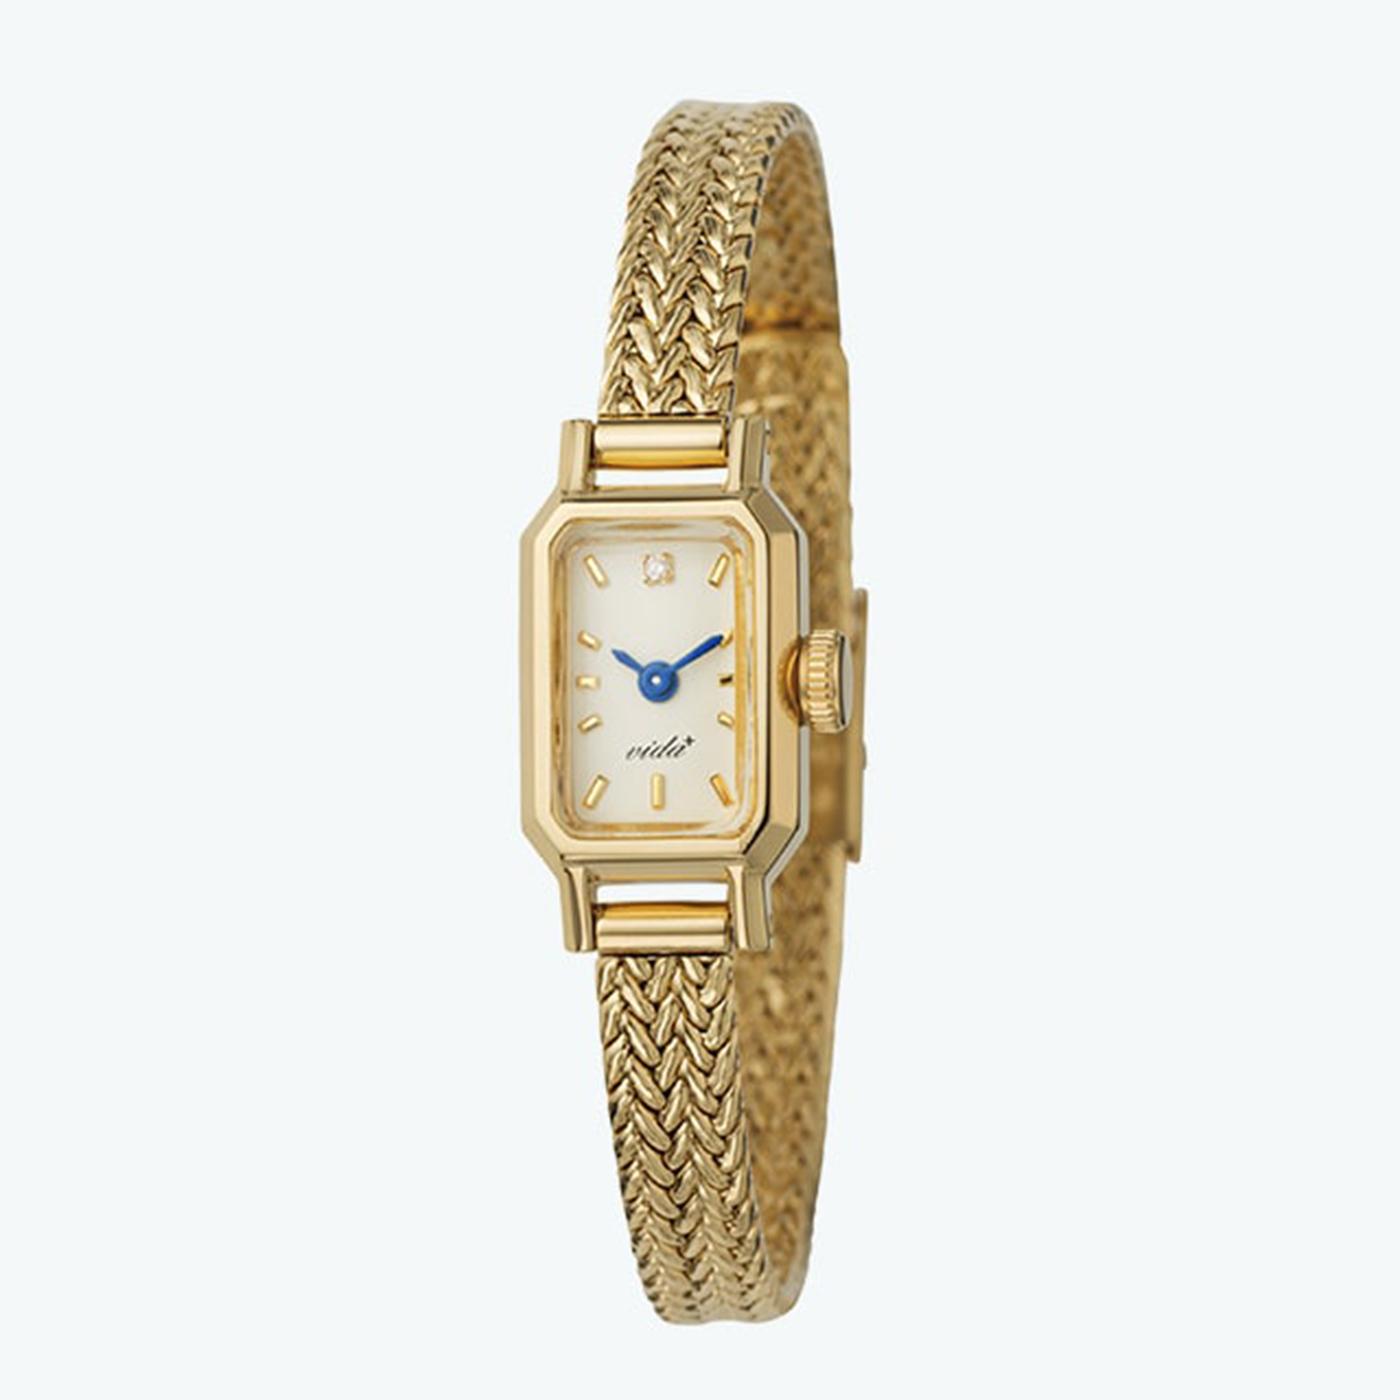 IEDIT[イディット] SELECT VIDA+ ヴィーダプラス 12時位置のダイヤモンドが輝くアヤメ織りベルト時計〈ゴールド〉 J84966GM